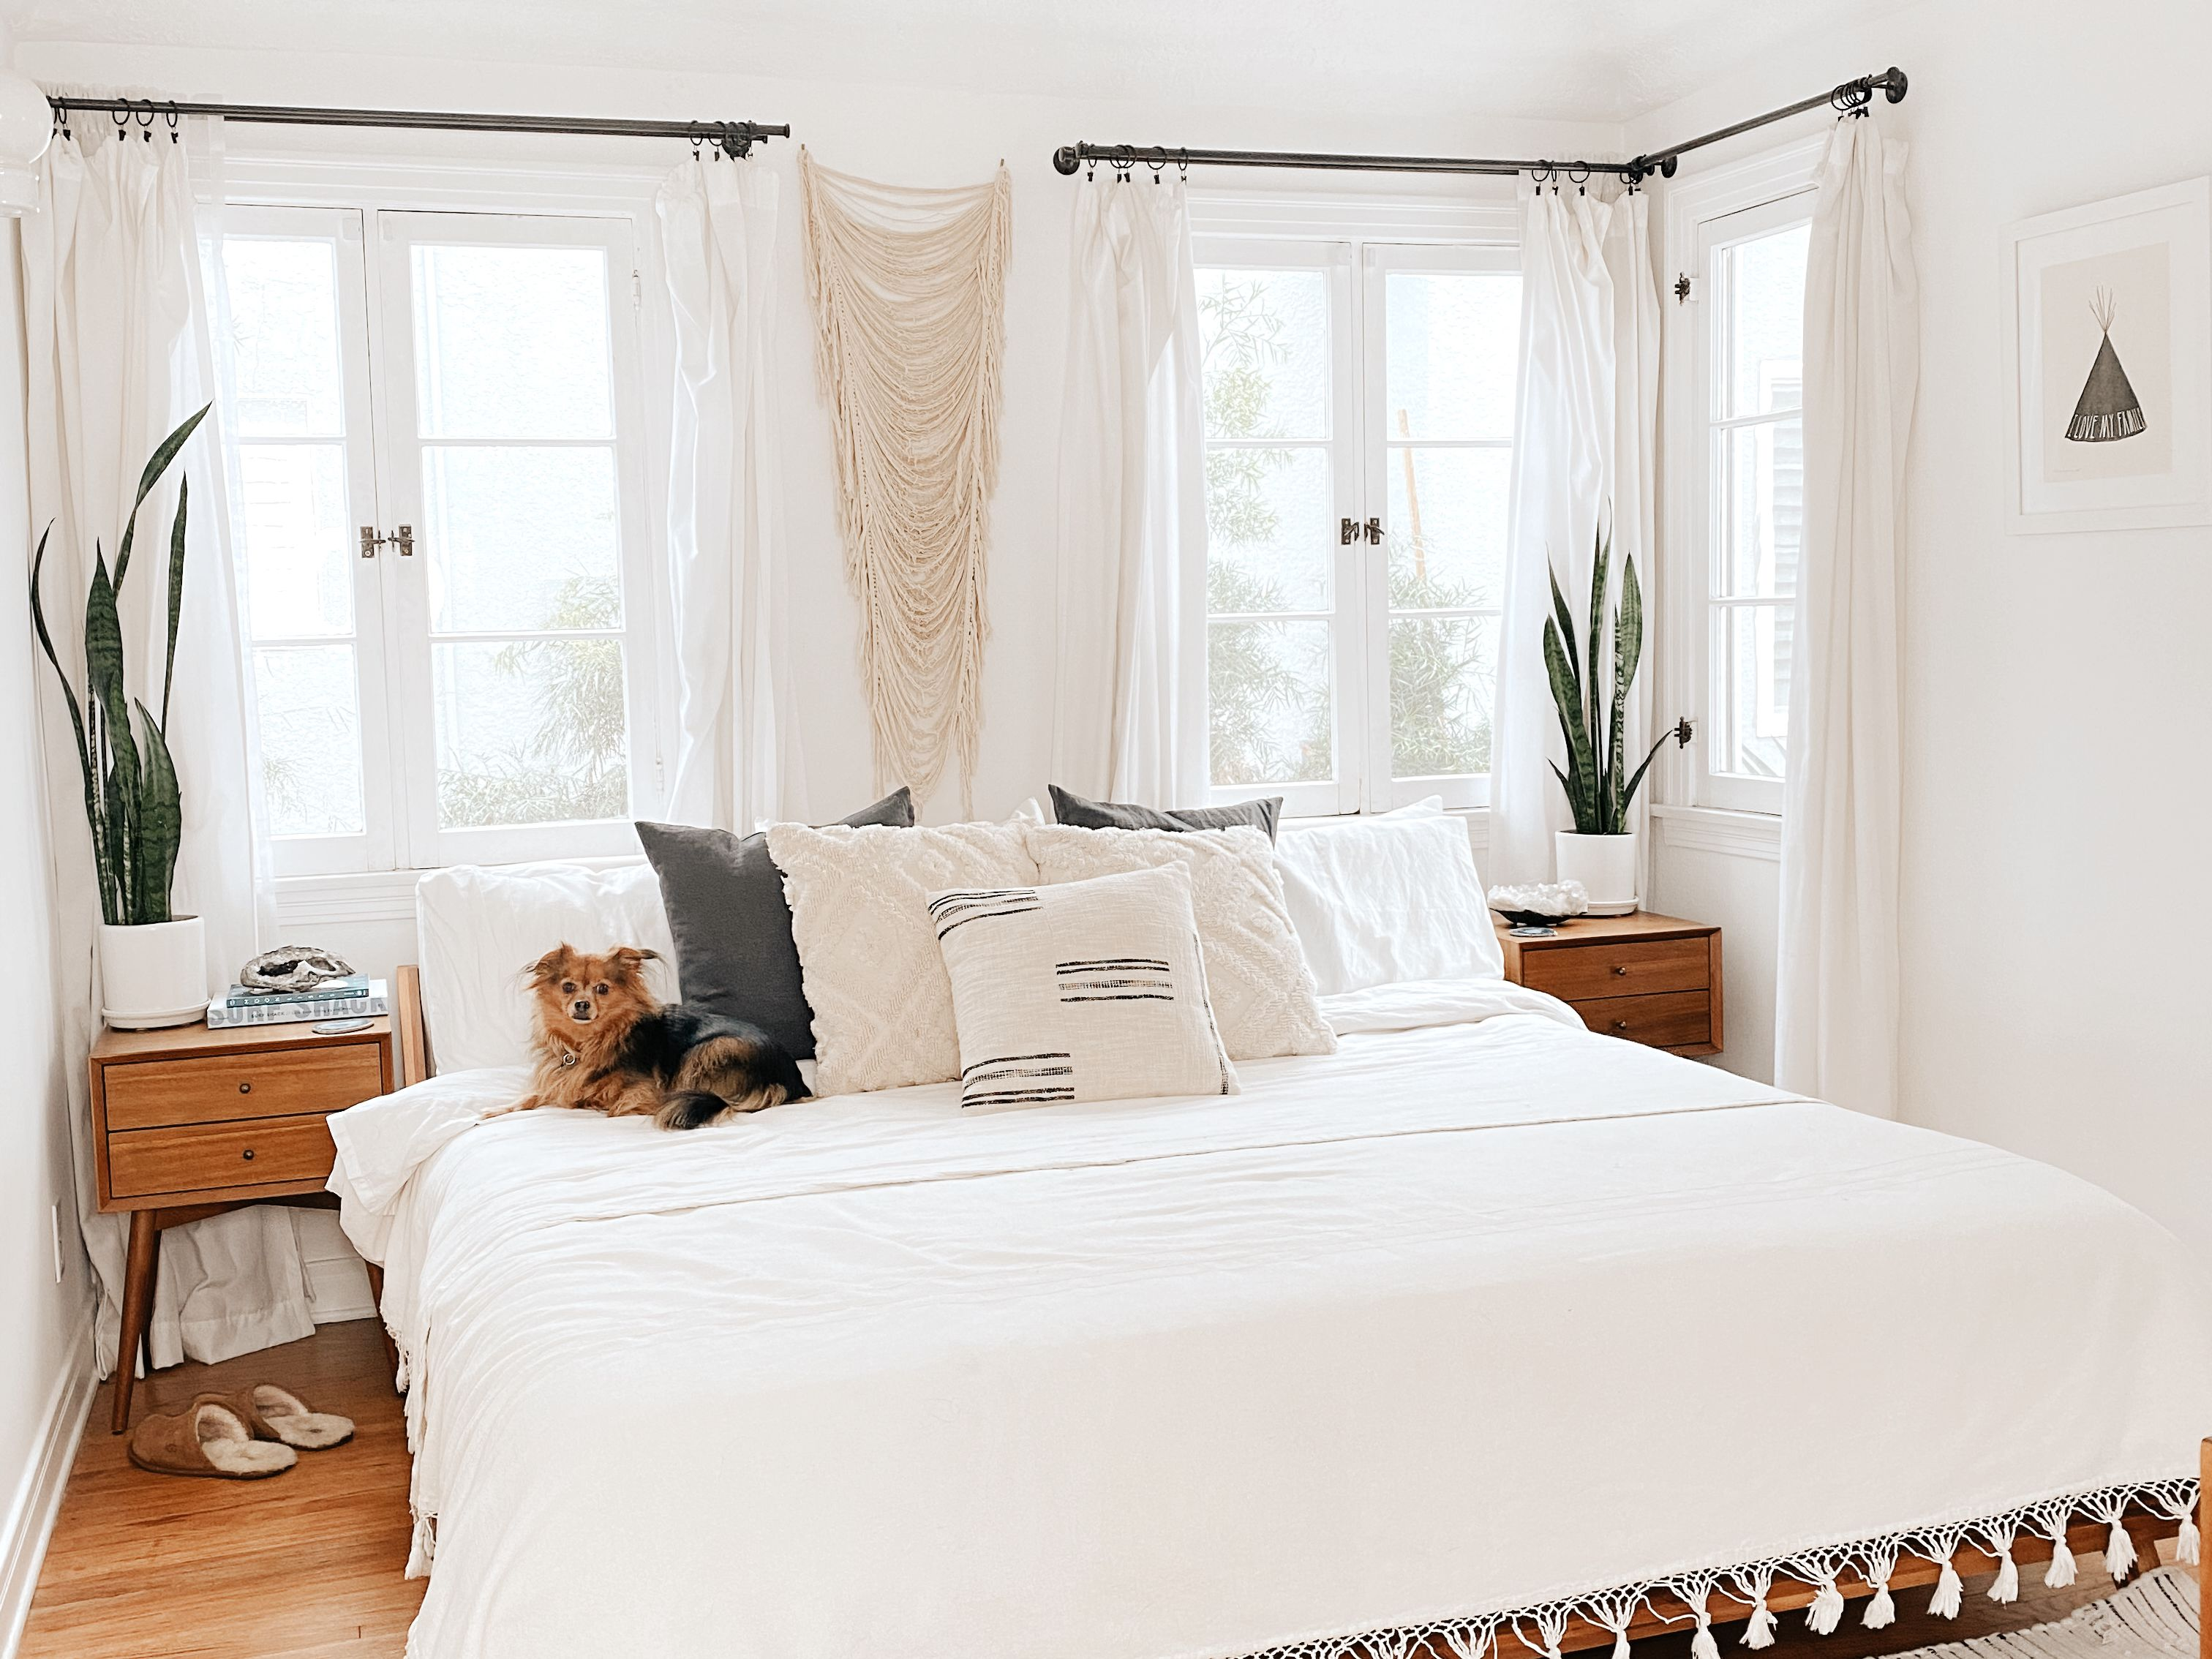 20 White Bedroom Ideas For a Cozy Escape